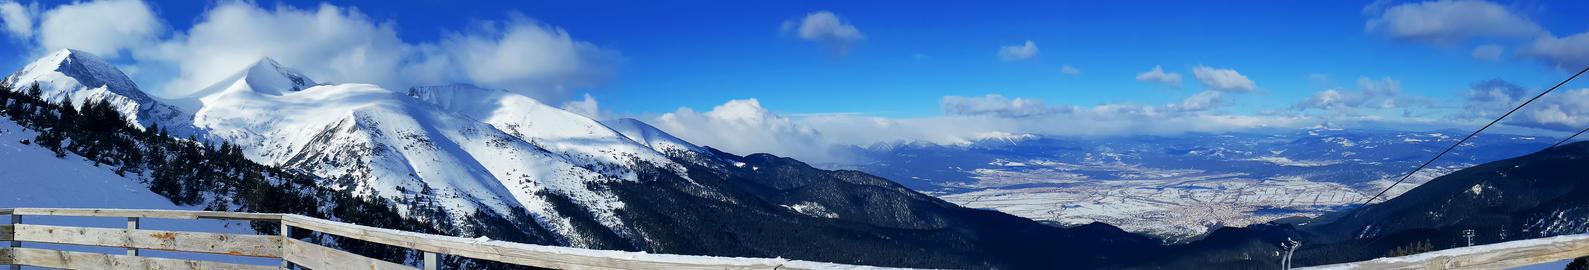 Mount panorama Photo